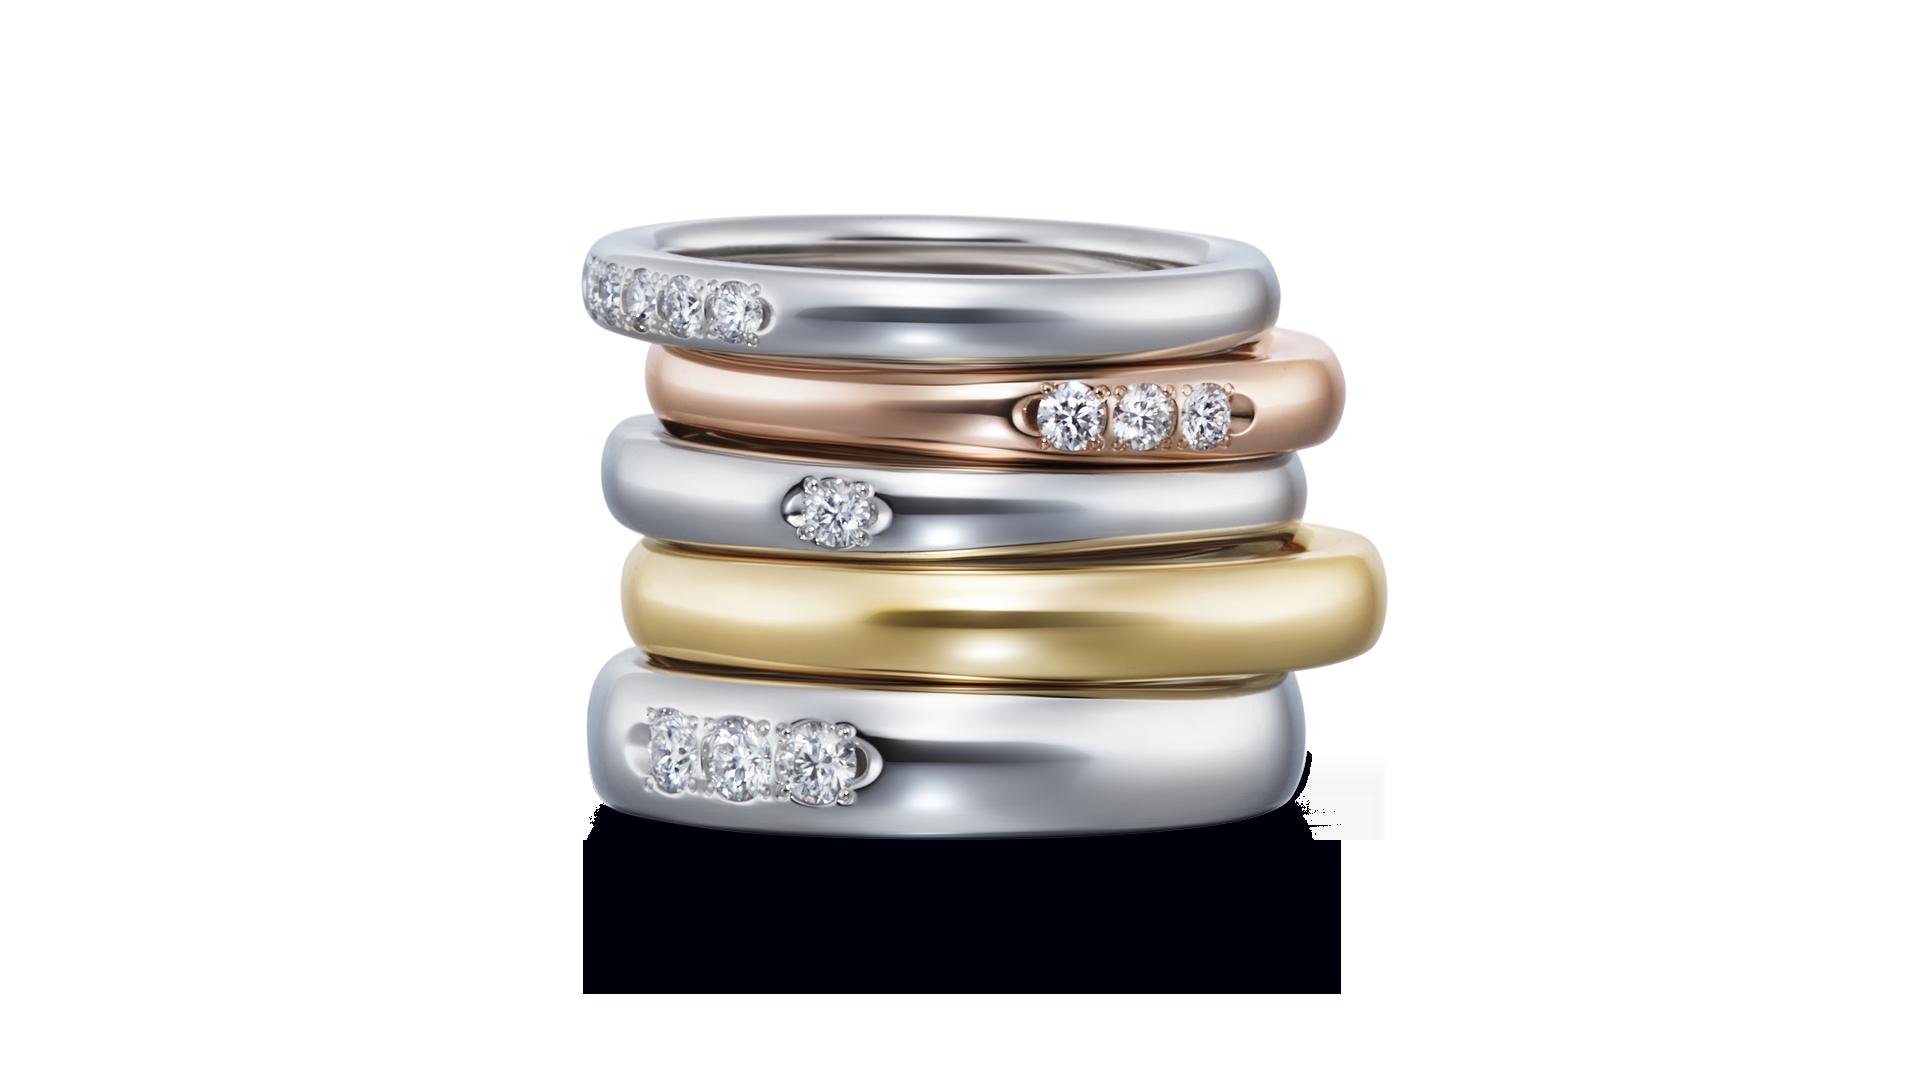 Origin Belief02 オリジンビリーフ02 | 結婚指輪サムネイル 3